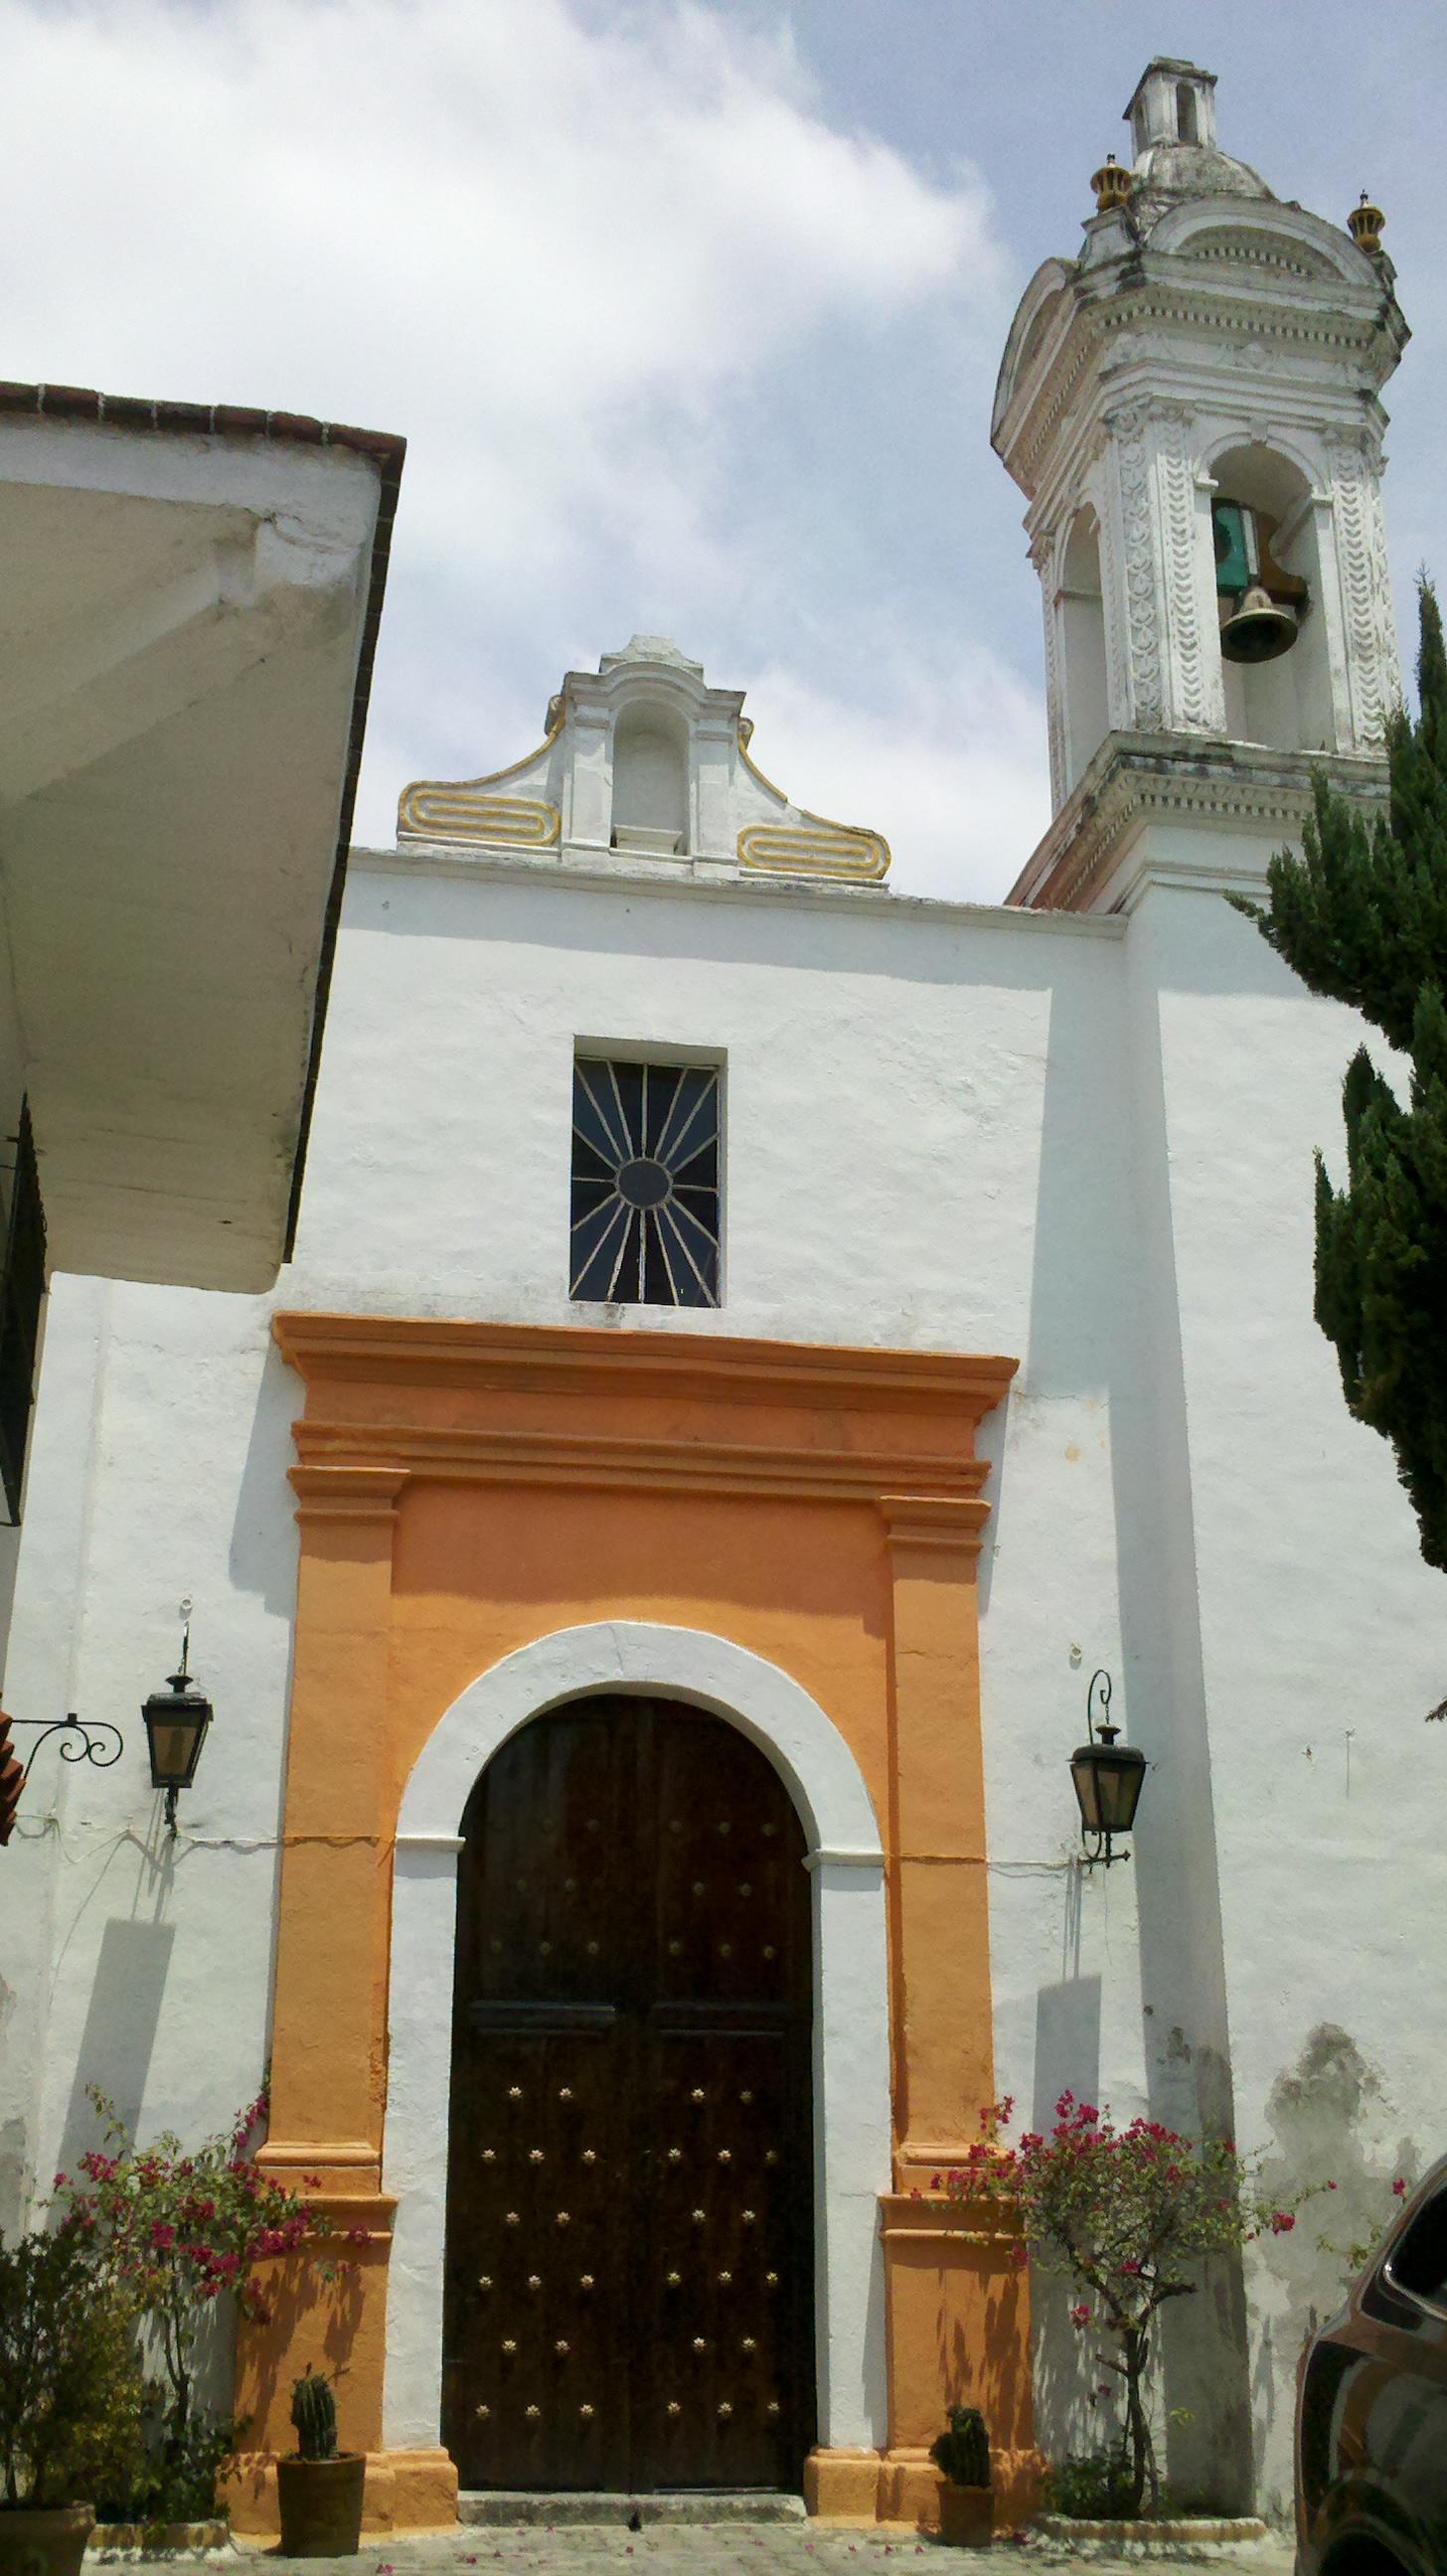 Parroquia de San Sebastián Mártir